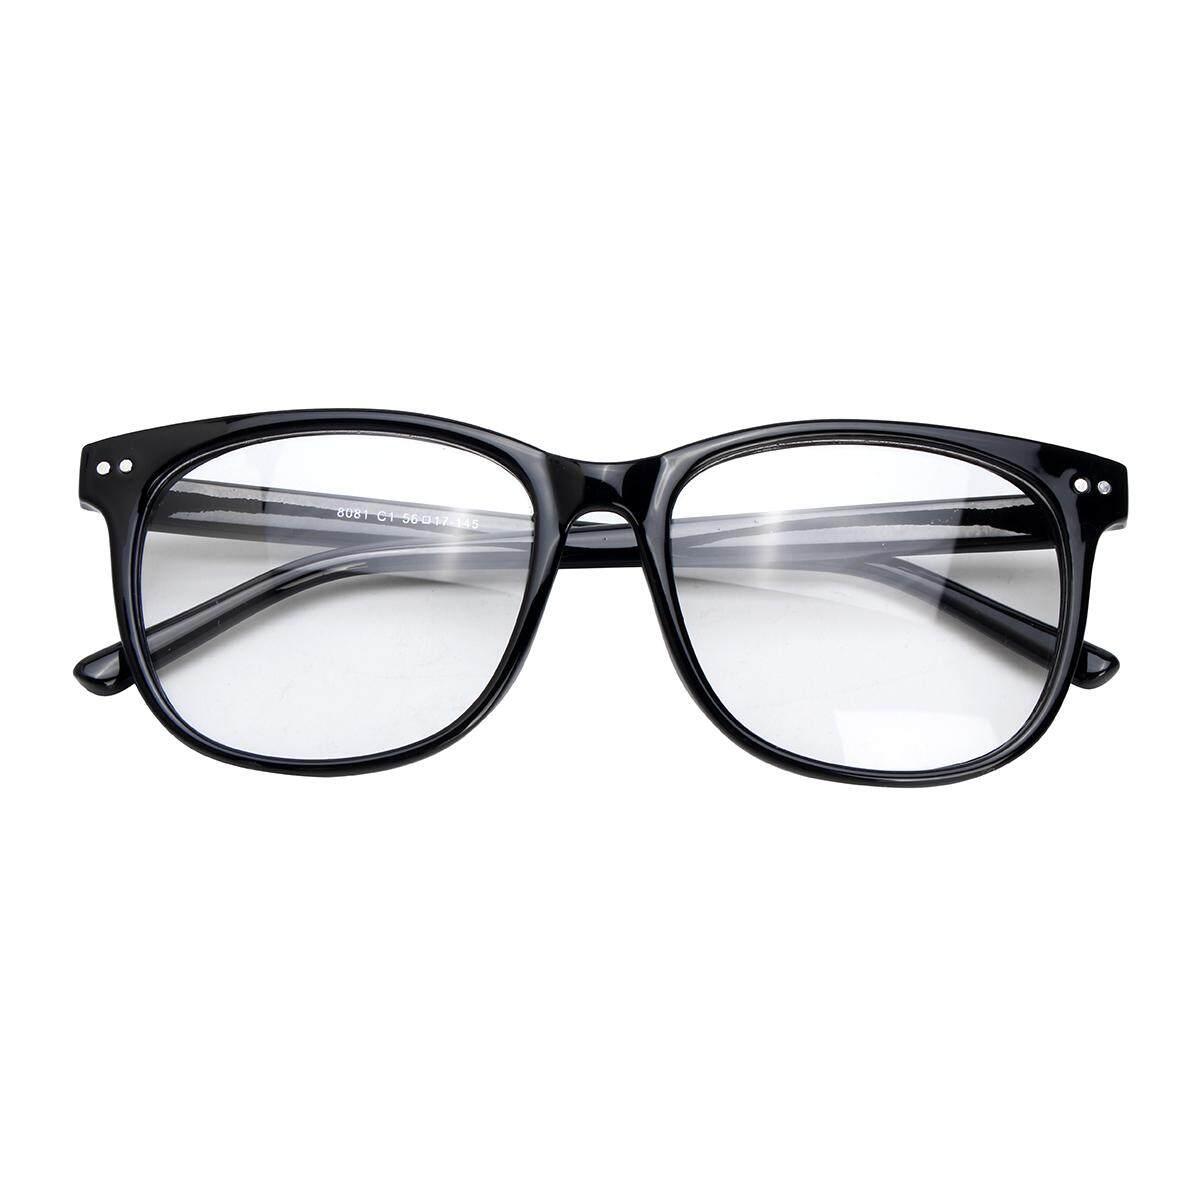 Men Women Spectacles Round Eyeglass Chic Full Rim Frames Optical Eyewear Glasses By Moonbeam.